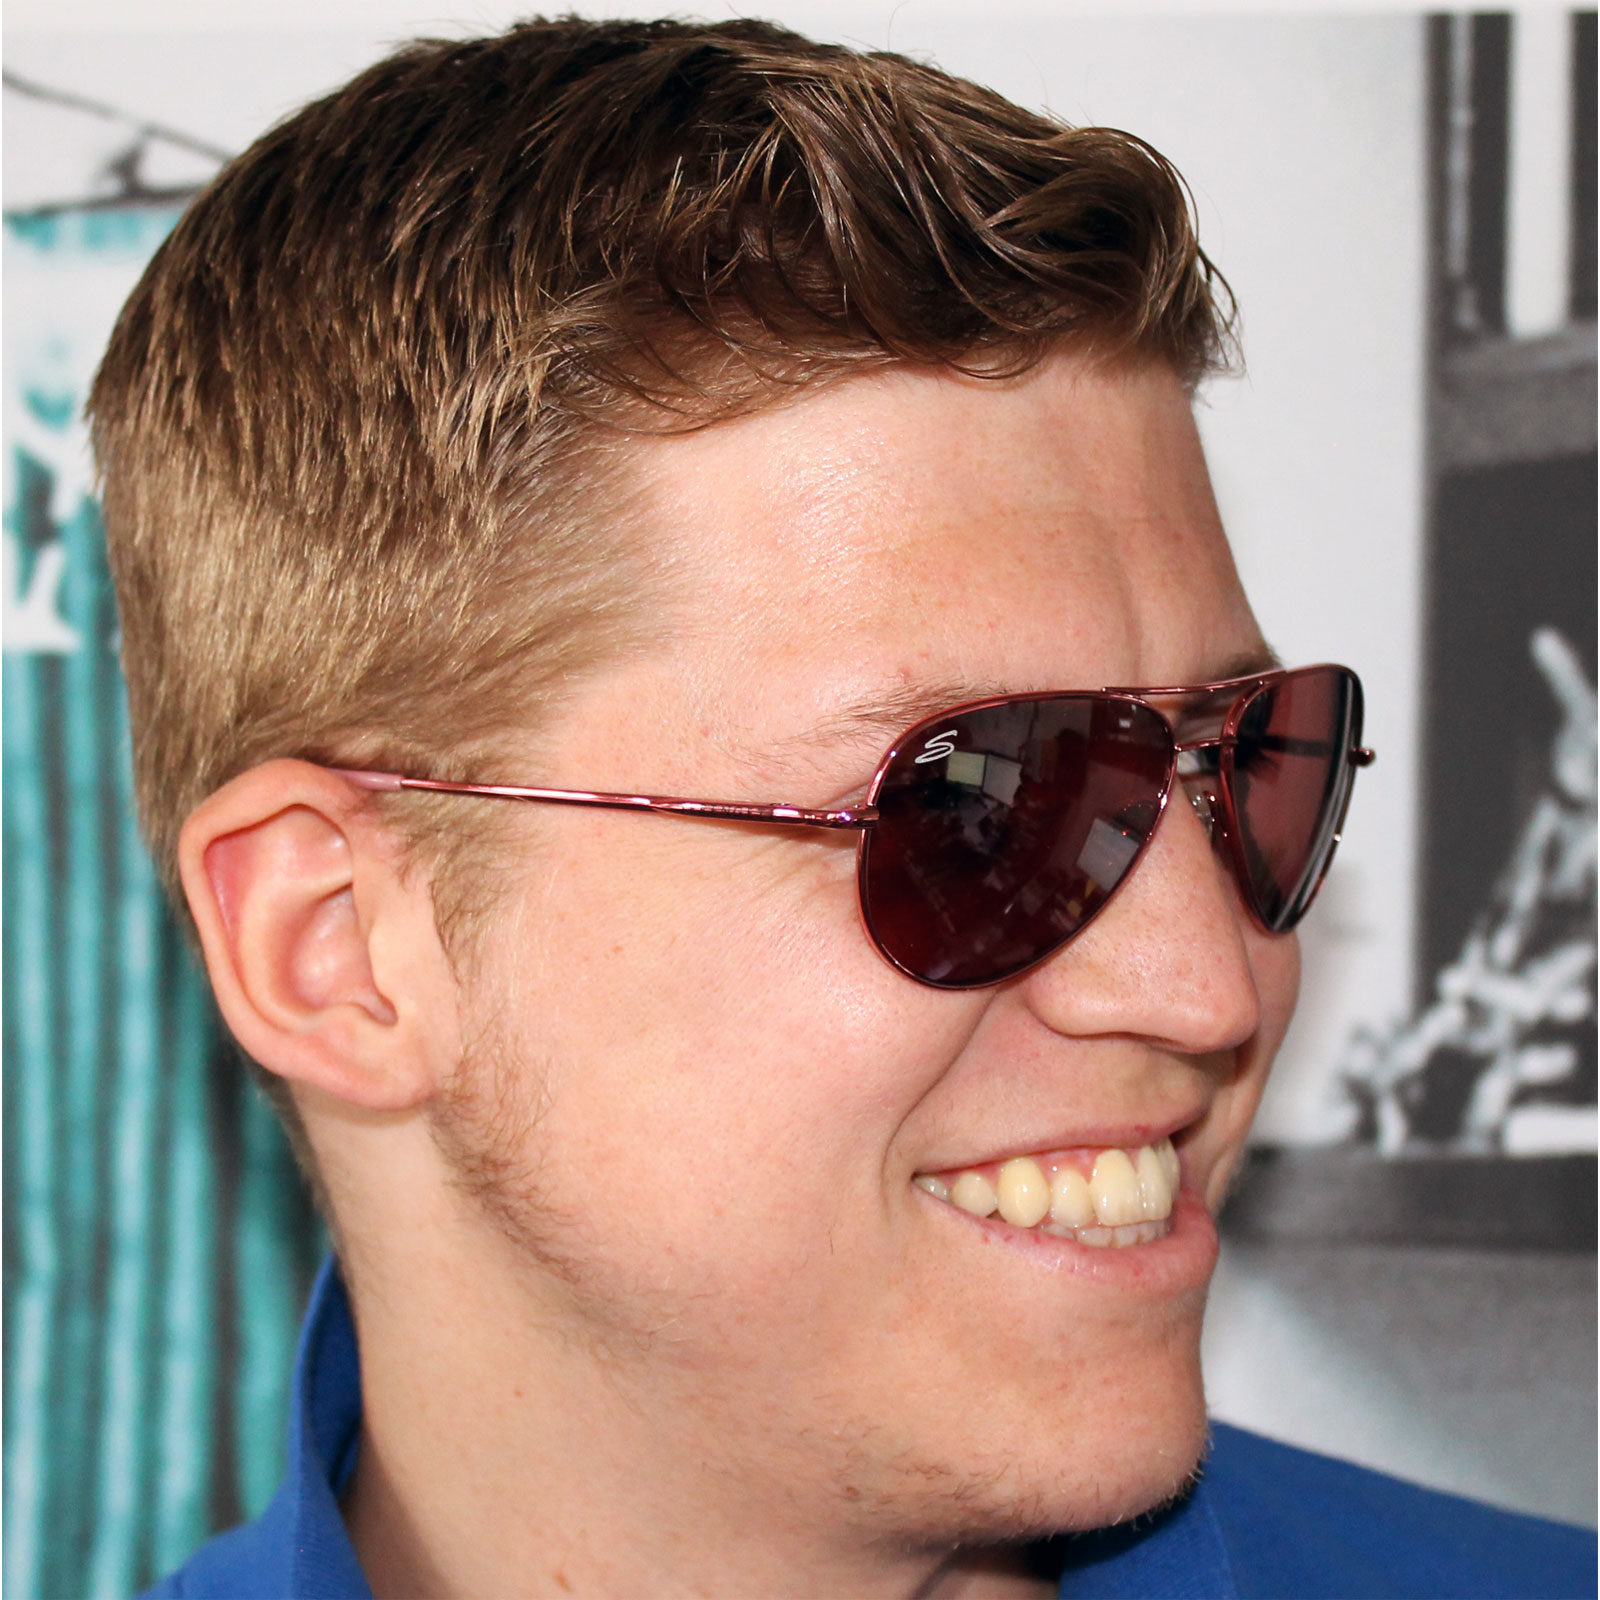 Aviator sunglasses for small face -  Serengeti Small Aviator Sunglasses Thumbnail 3